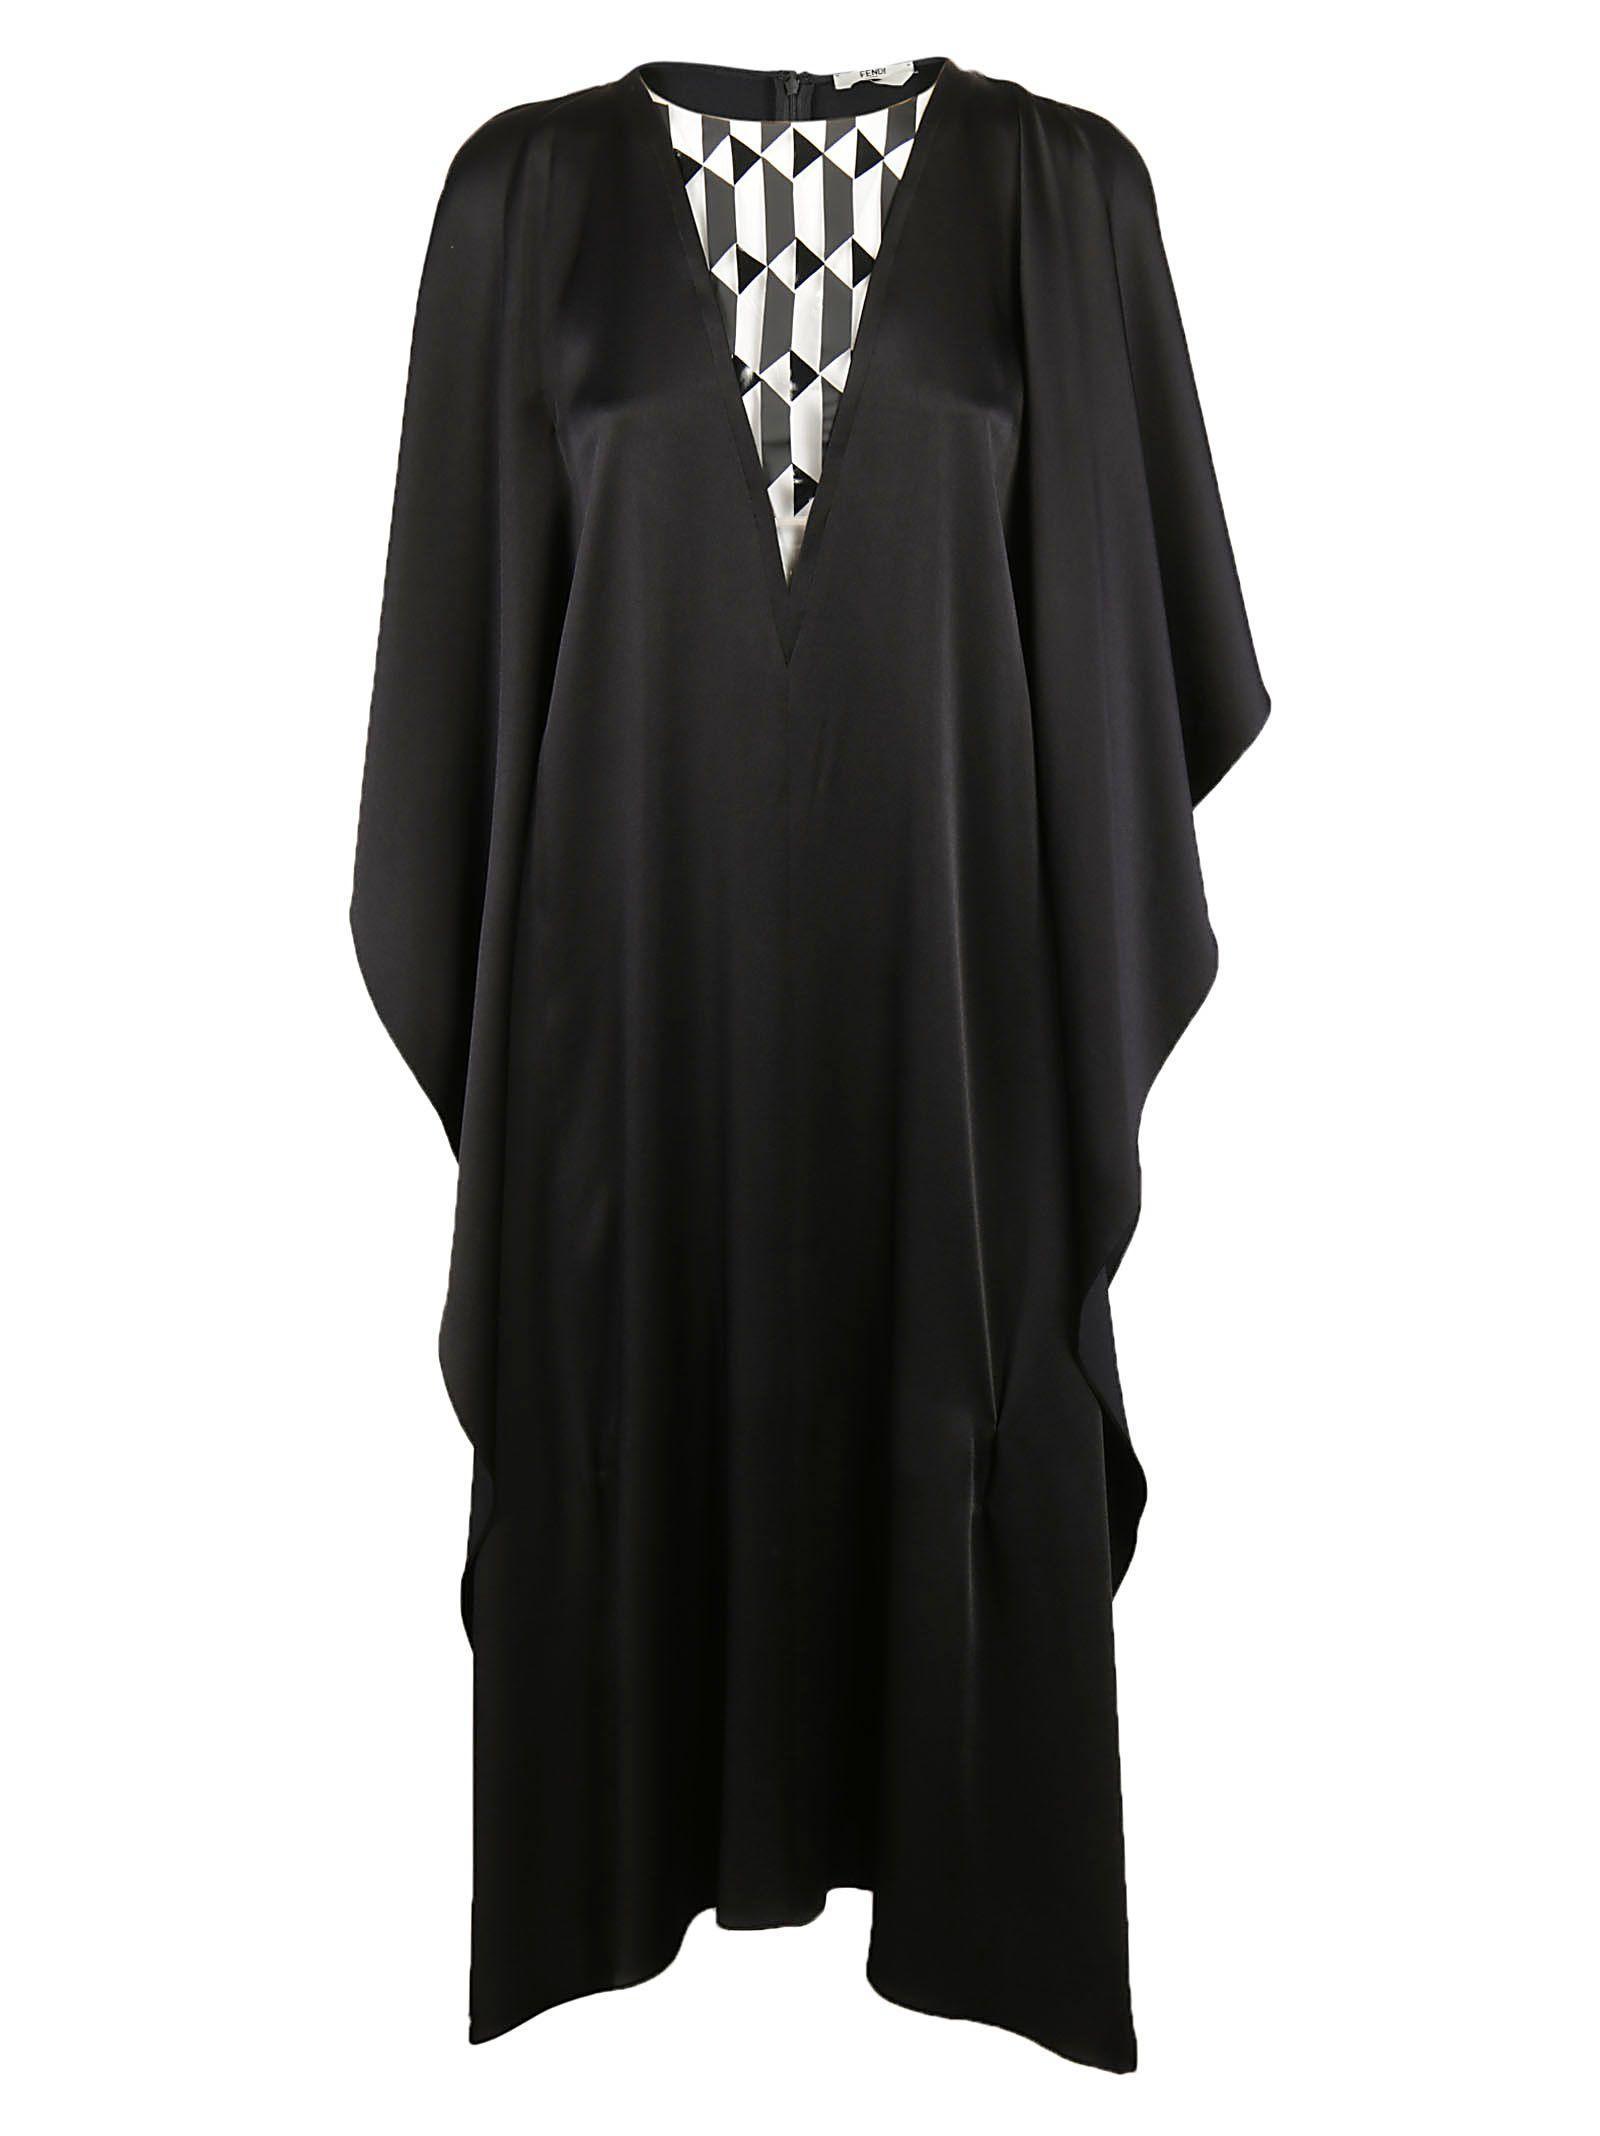 Fendi Ruffled Dress In Black